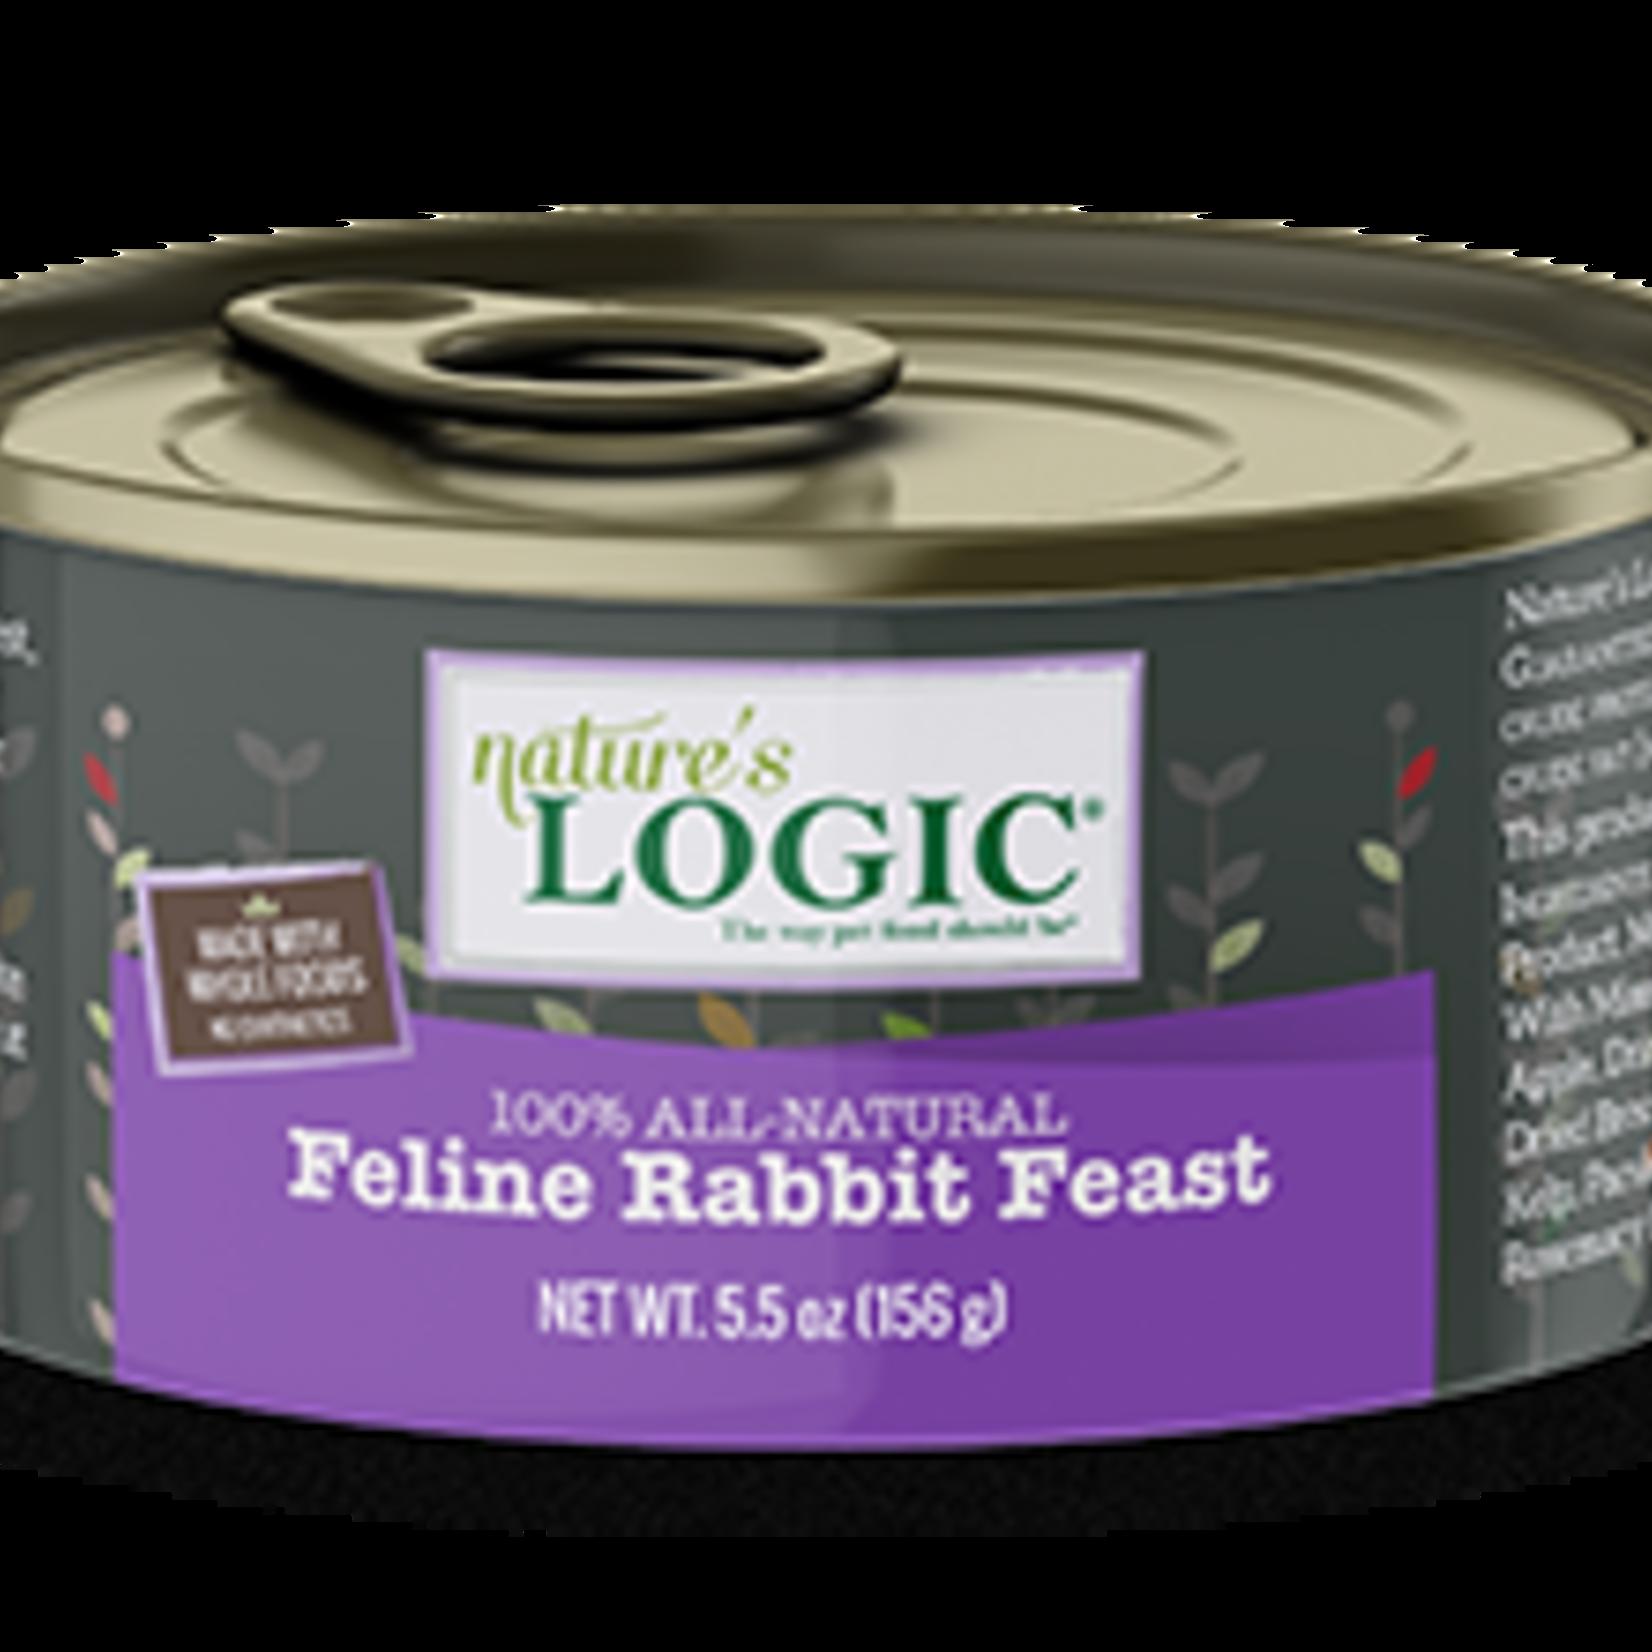 Natures Logic Natures Logic Cat Grain Free Rabbit Feast 5.5 OZ